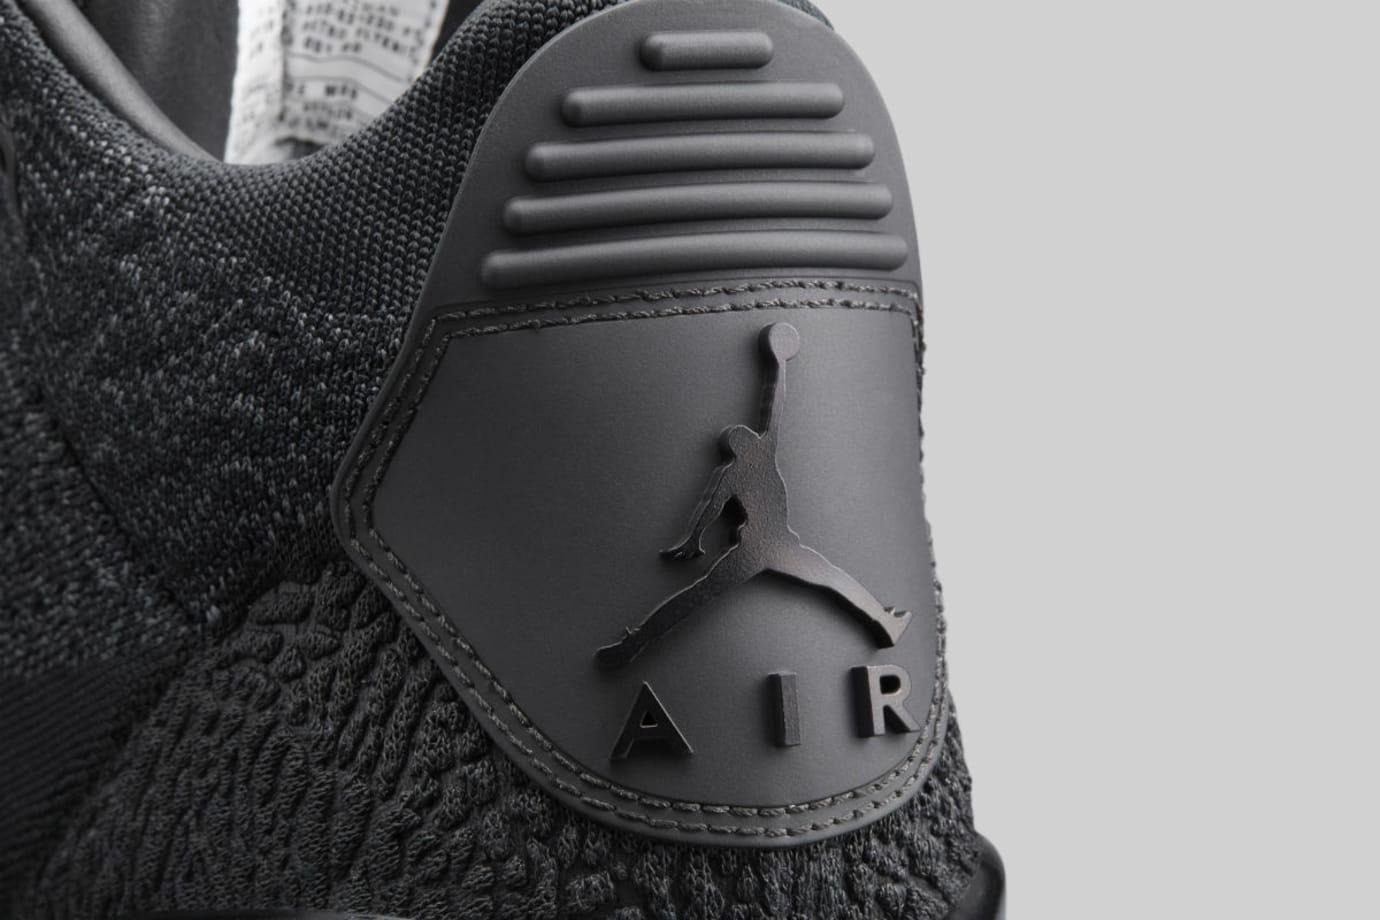 Air Jordan 3 III Flyknit Black Glow Release Date AQ1005-001 Heel Tab